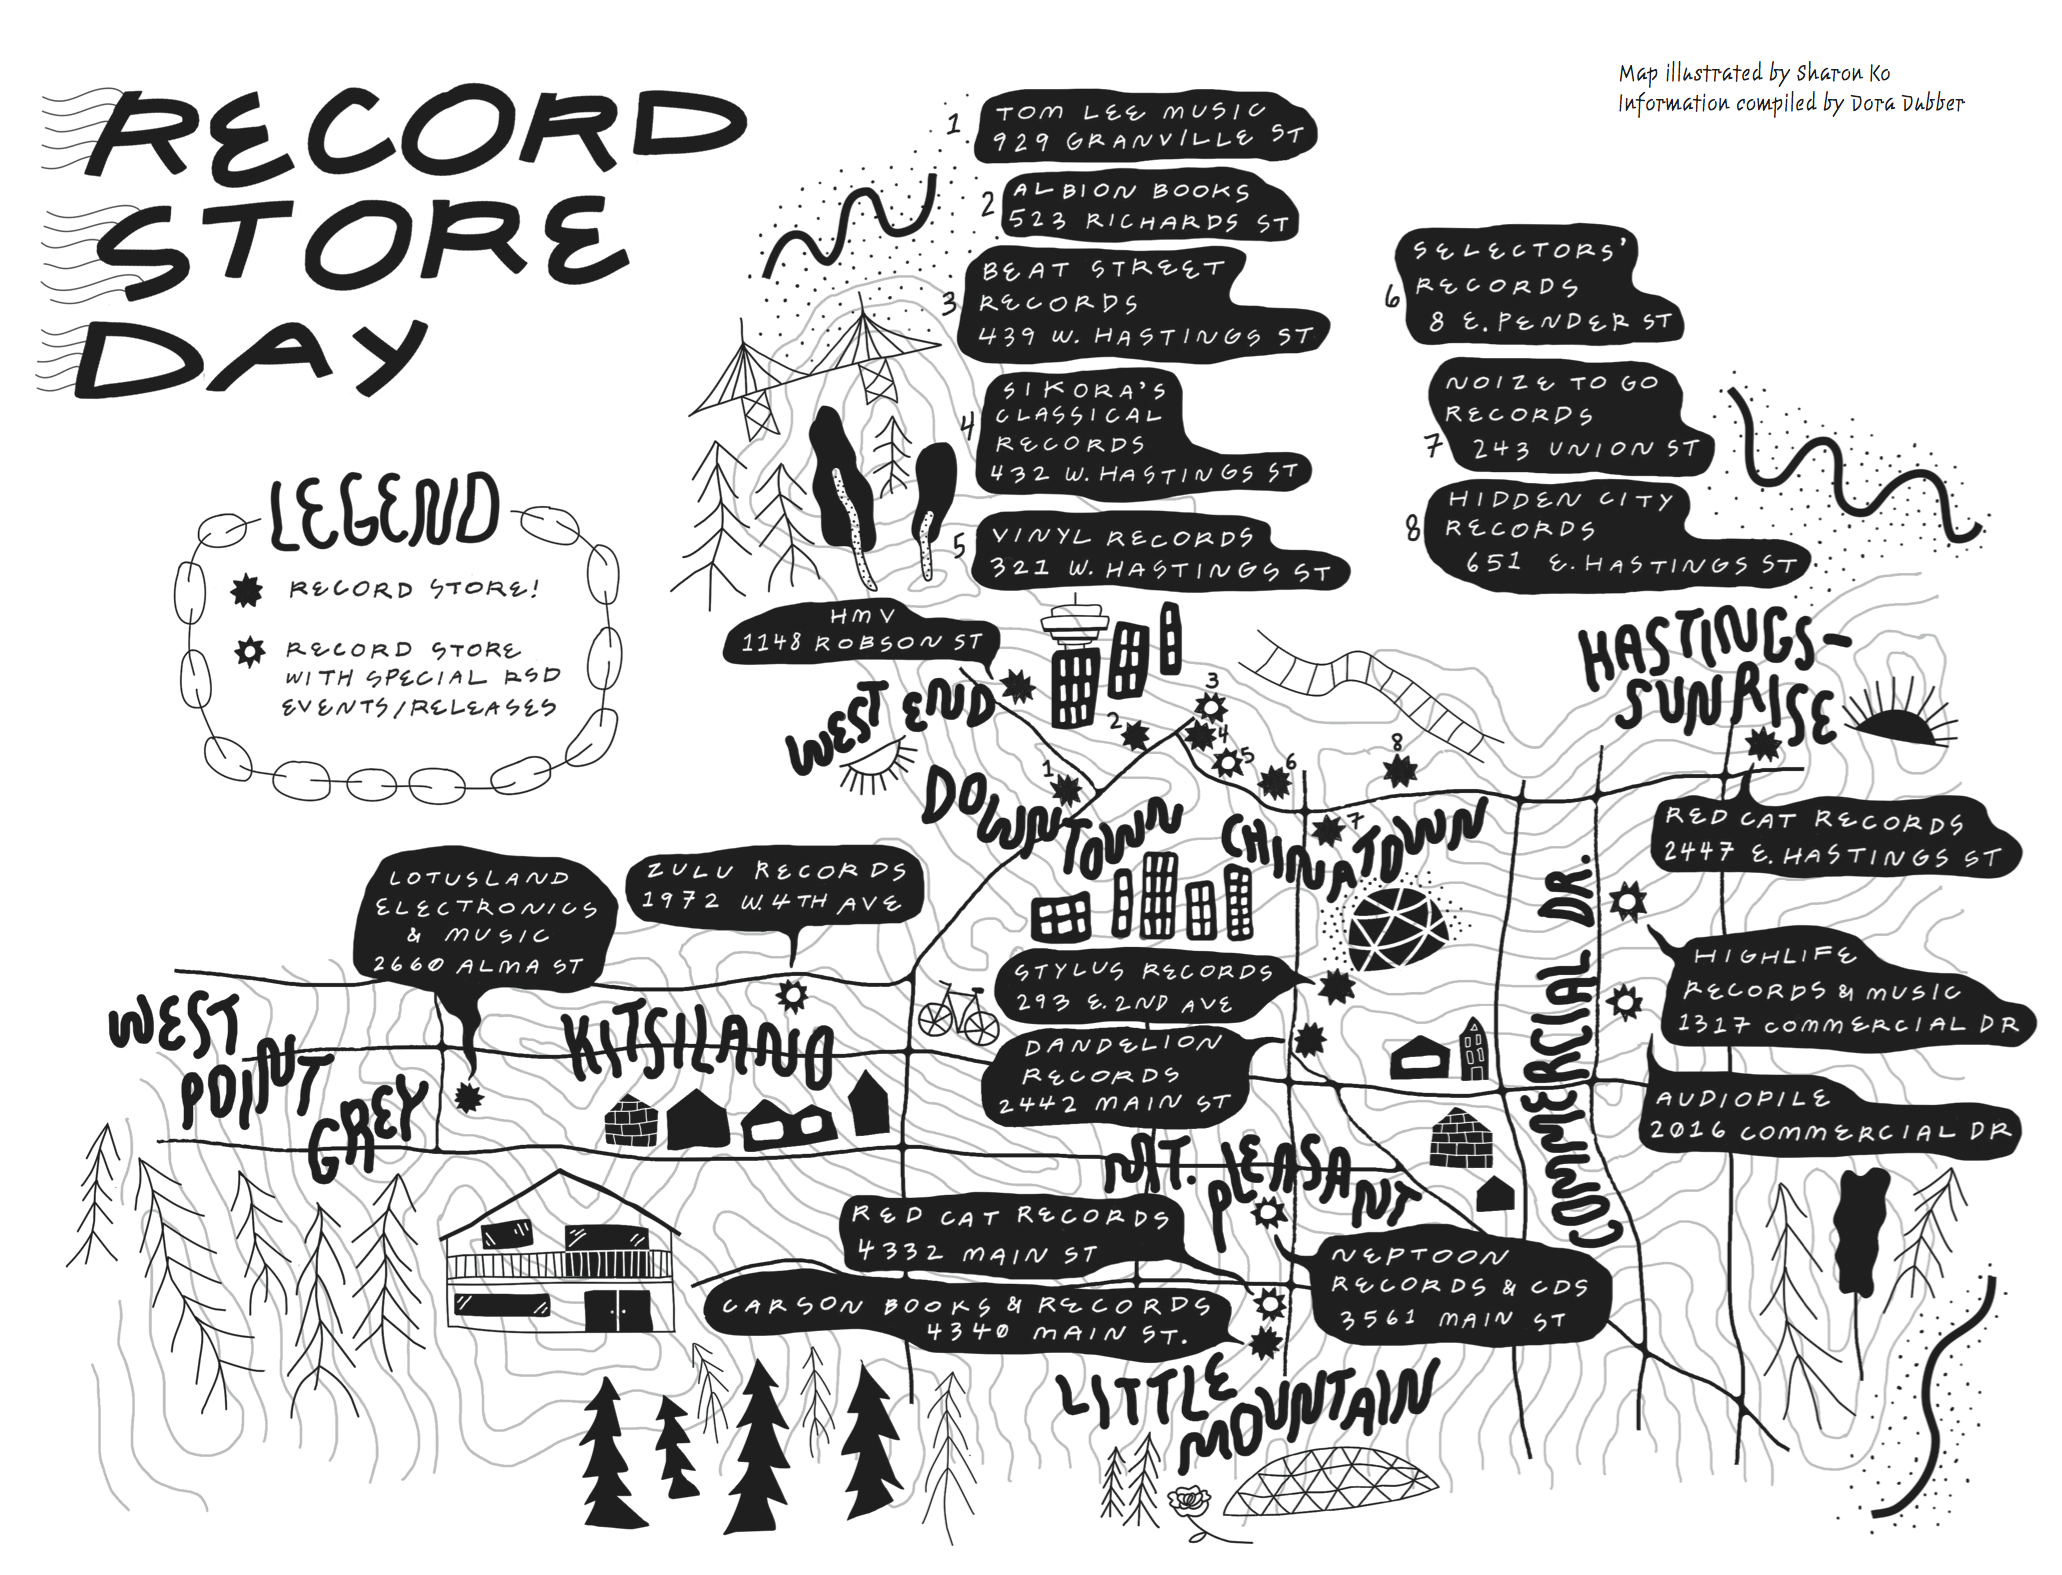 RecordStorey_Sharon_ Ko_ForDiscorder_April2017 EDITED